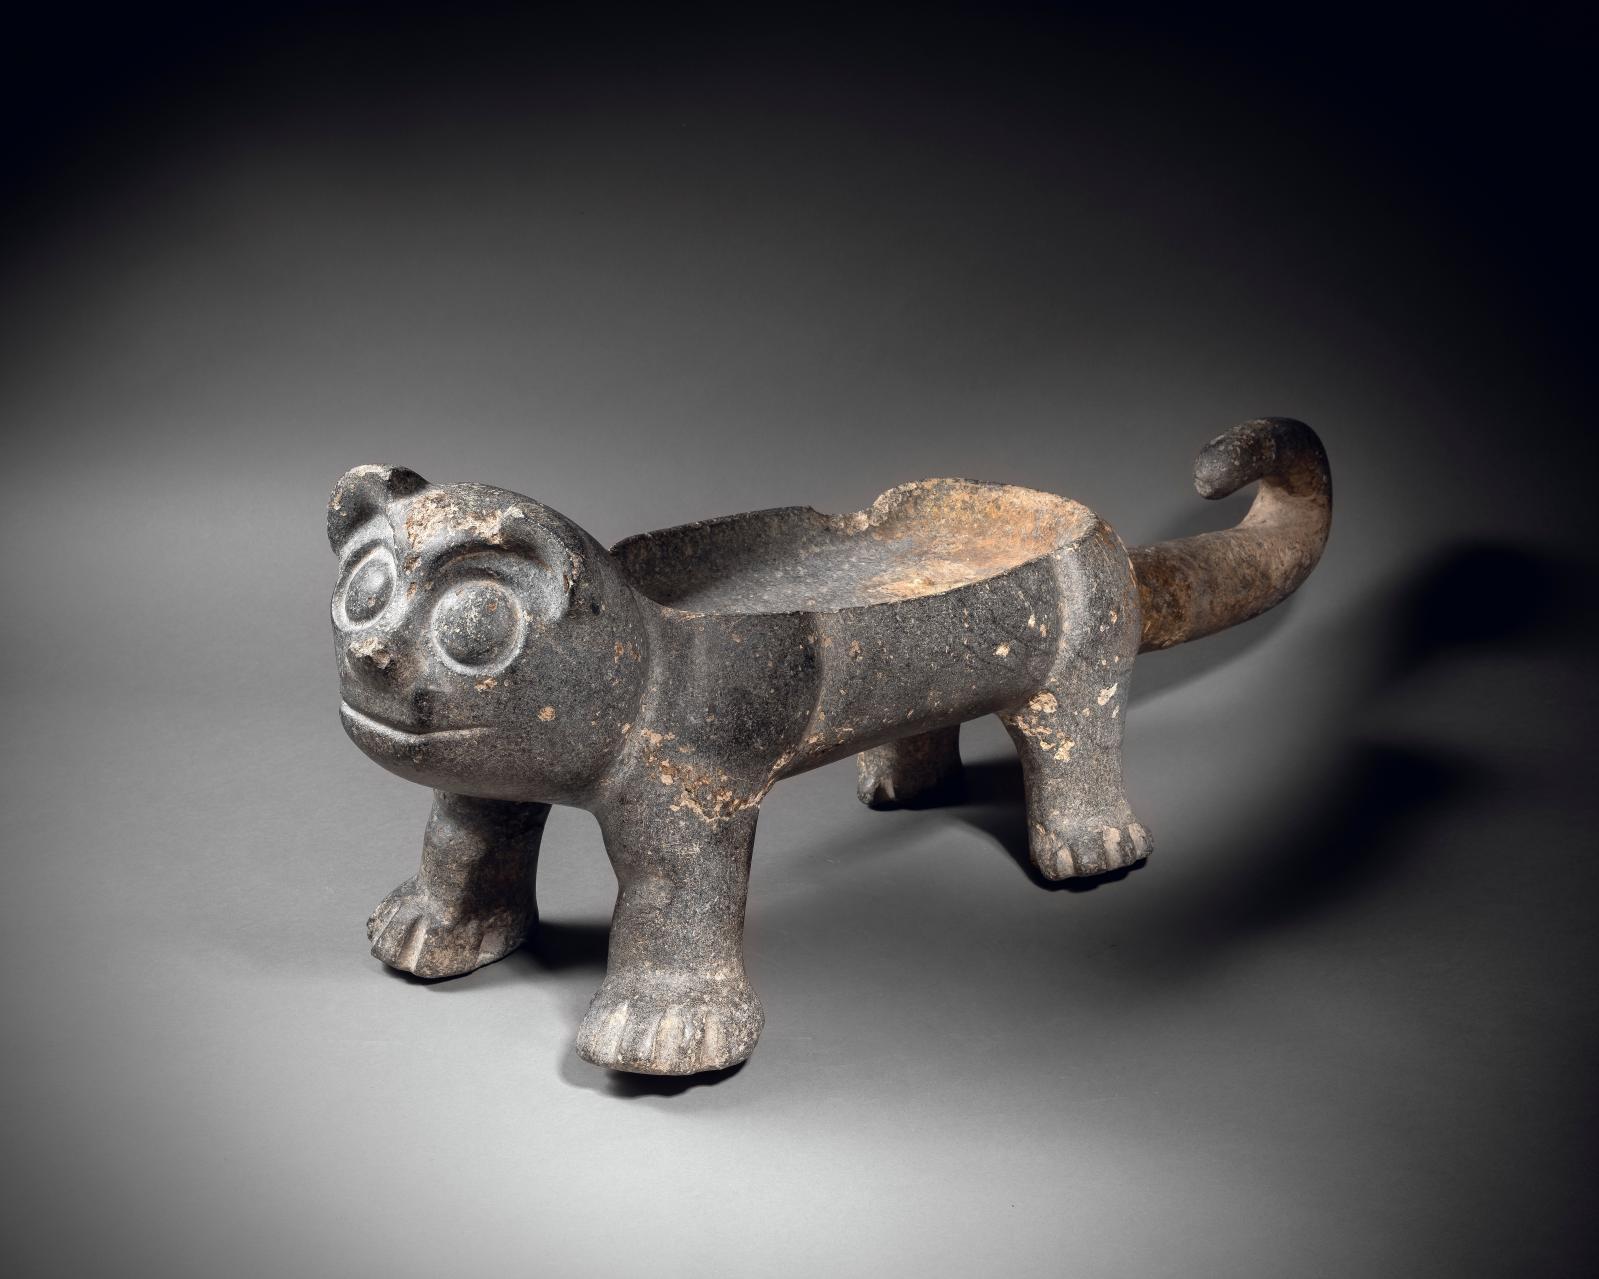 Xochipala culture, Middle Pre-classic Mexico, 1200-900 BC, large feline-shaped vessel, grey-dark green serpentine, h. 30.5, l. 87 cm. Estimate: €250,0